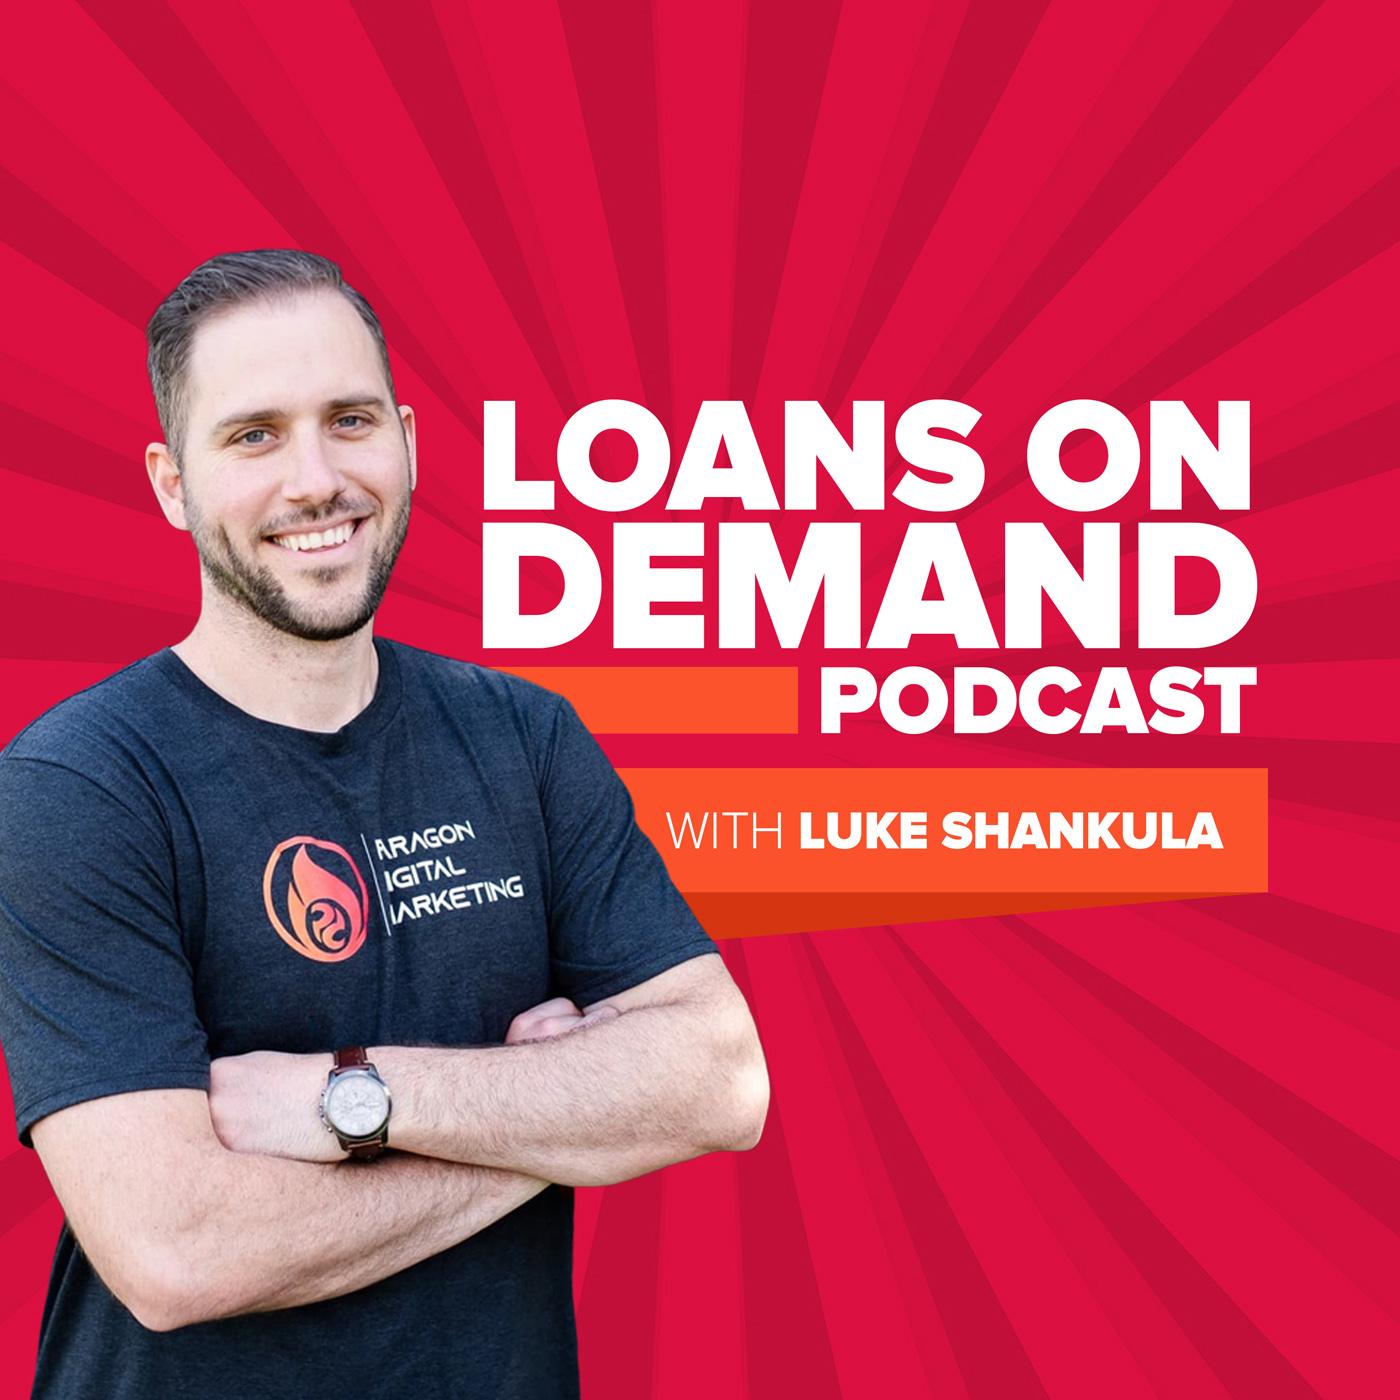 Loans On Demand Podcast show art